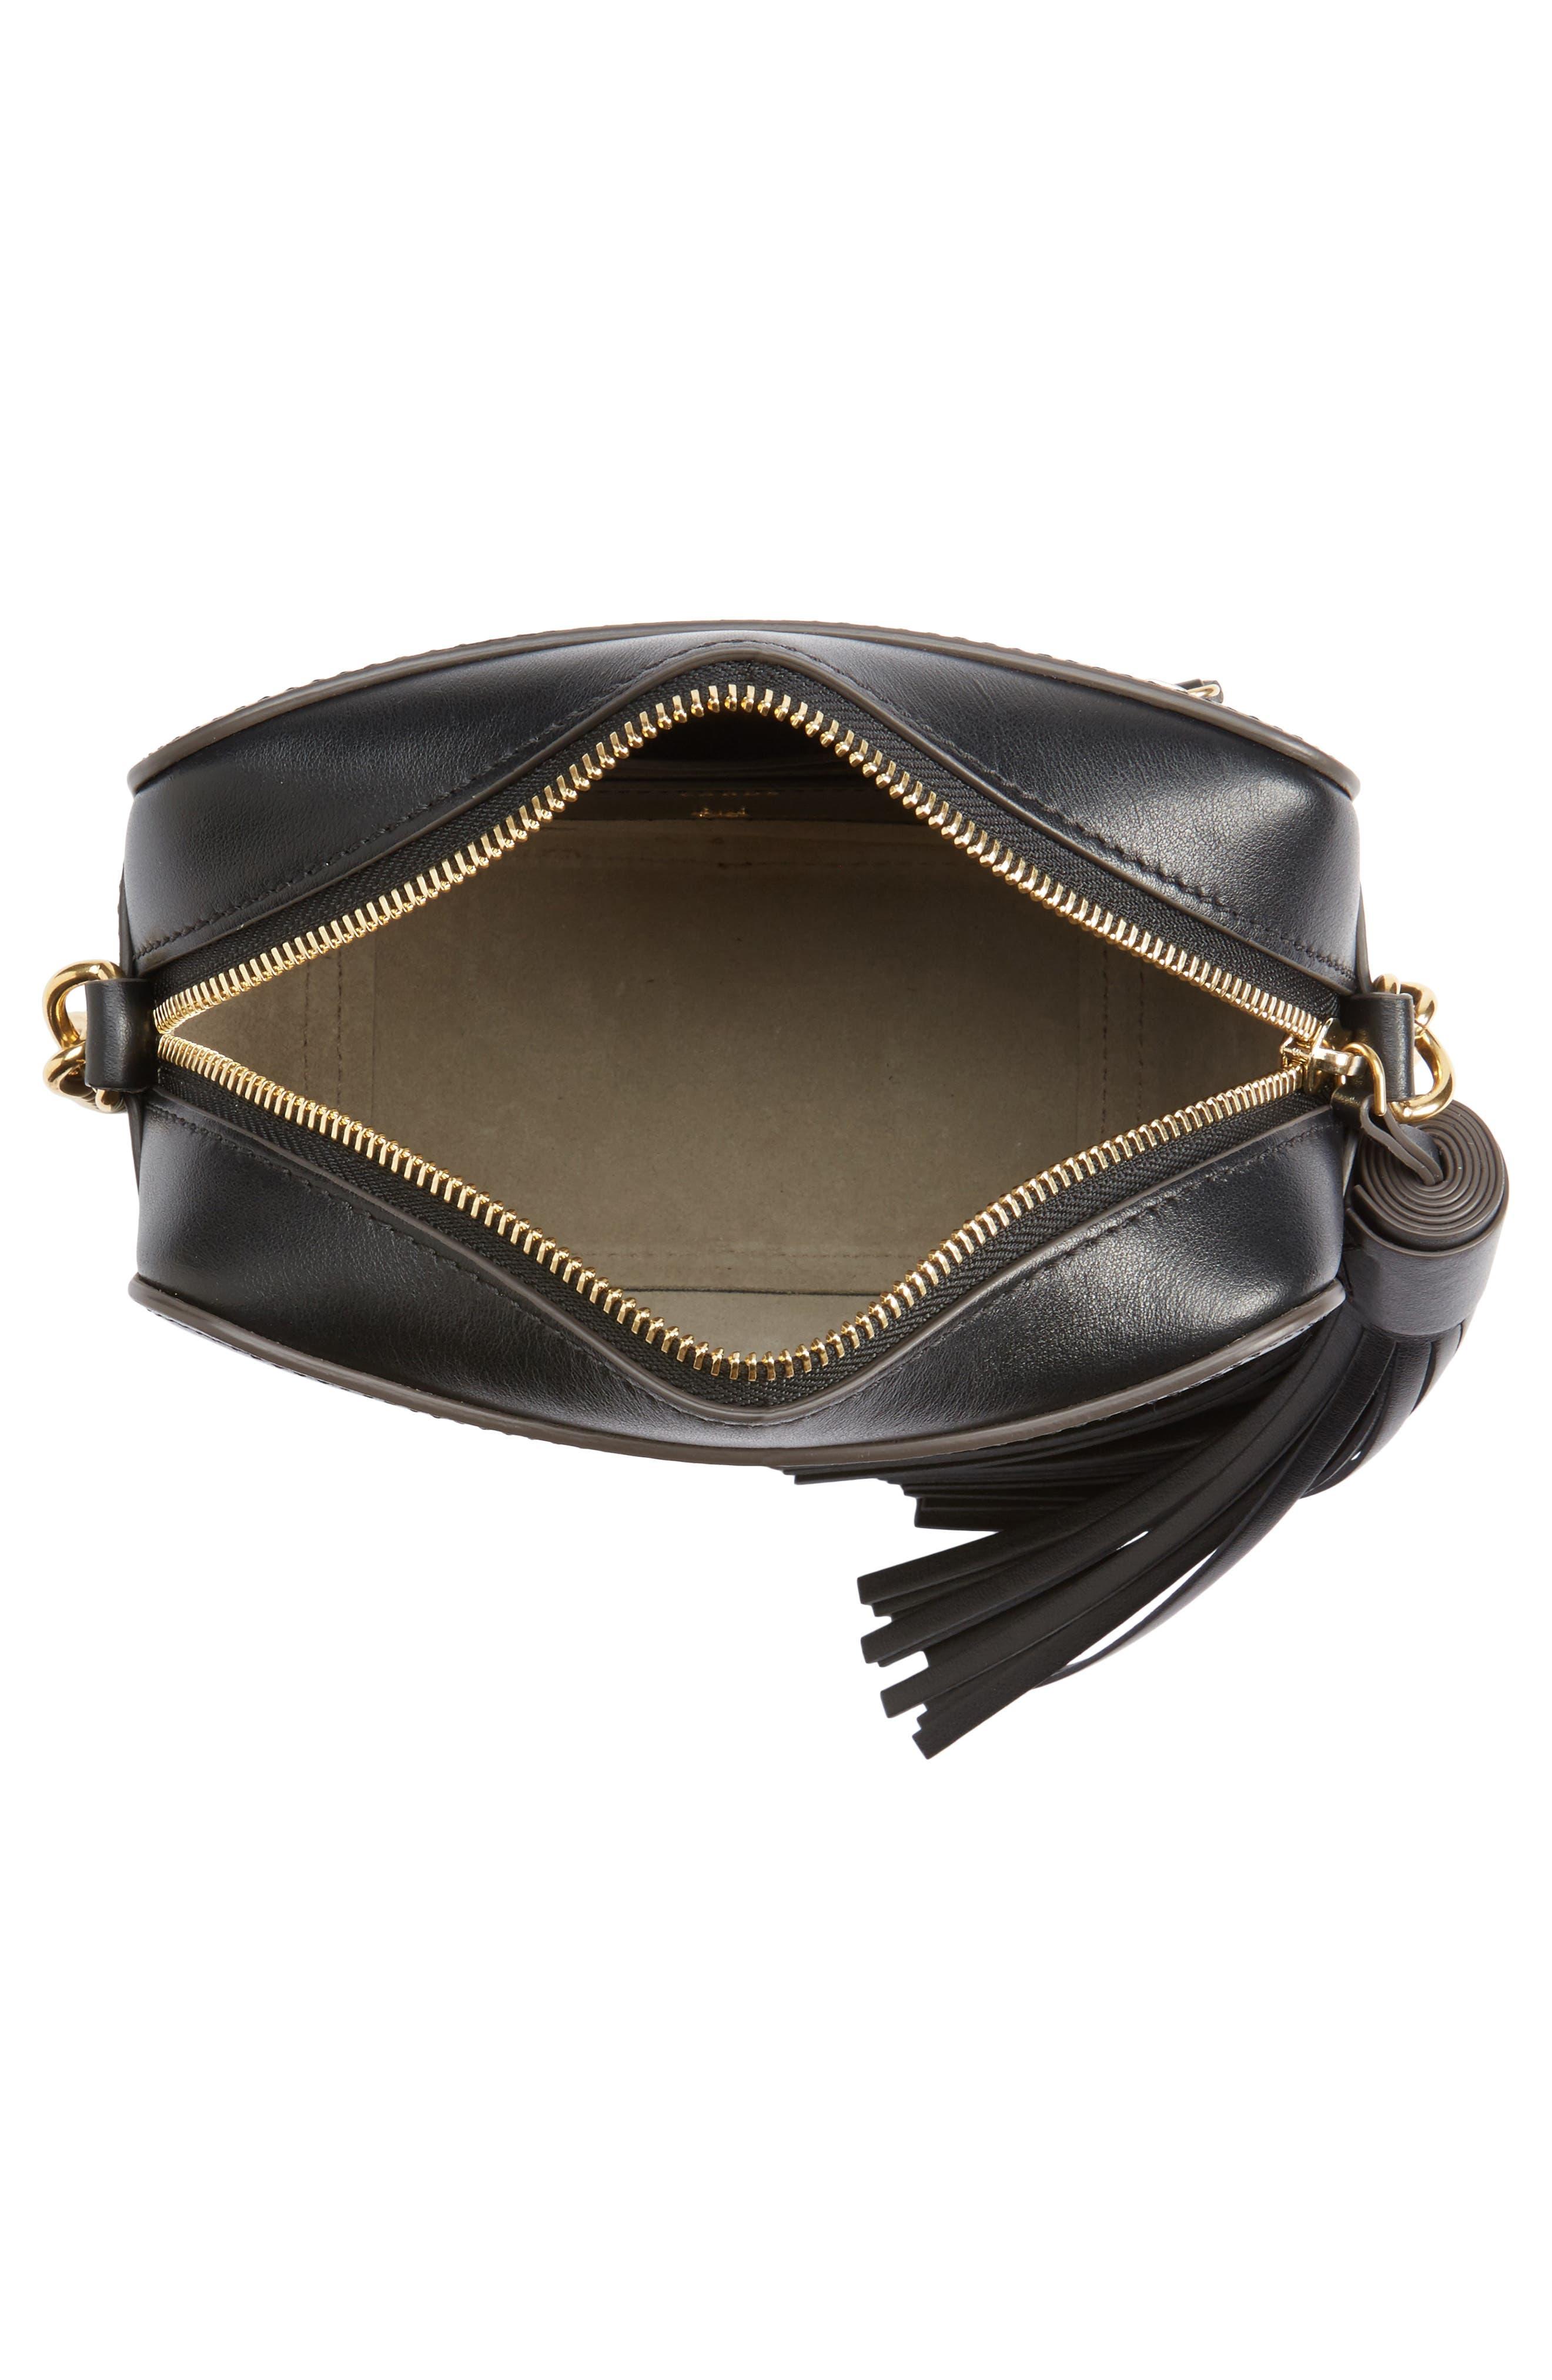 Eyes Camera Leather Crossbody Bag,                             Alternate thumbnail 4, color,                             BLACK